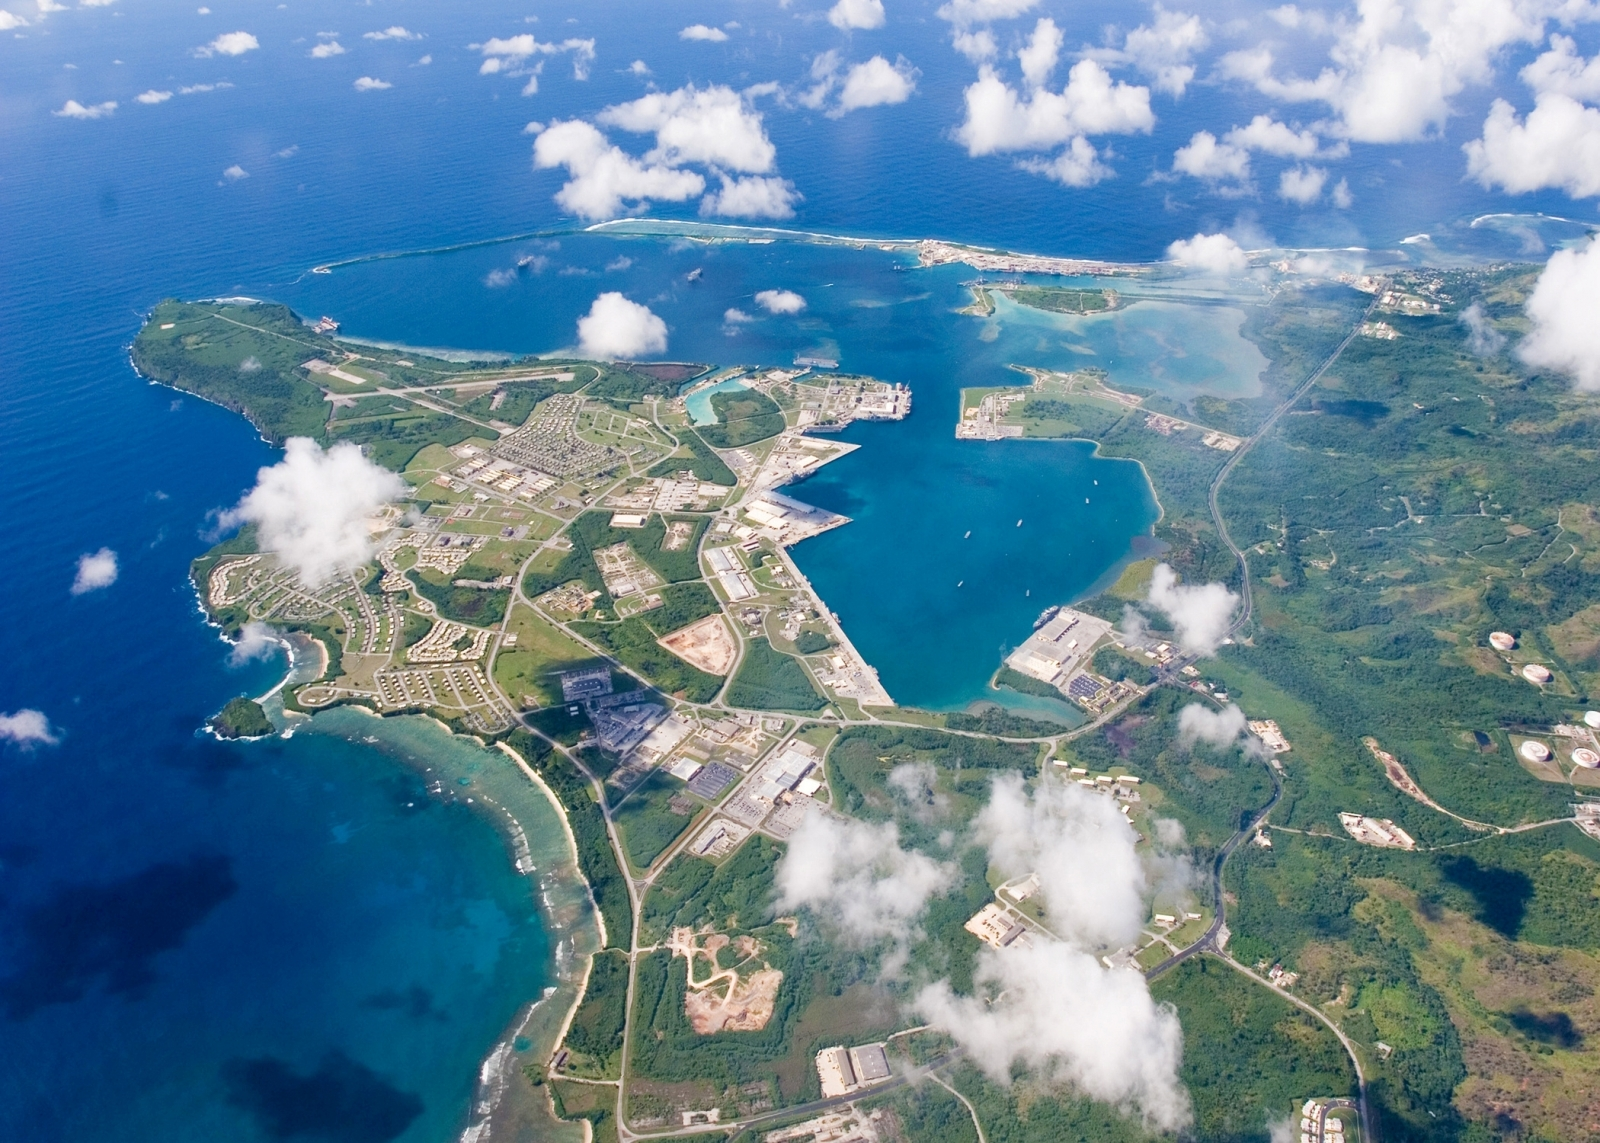 Guam aerial view